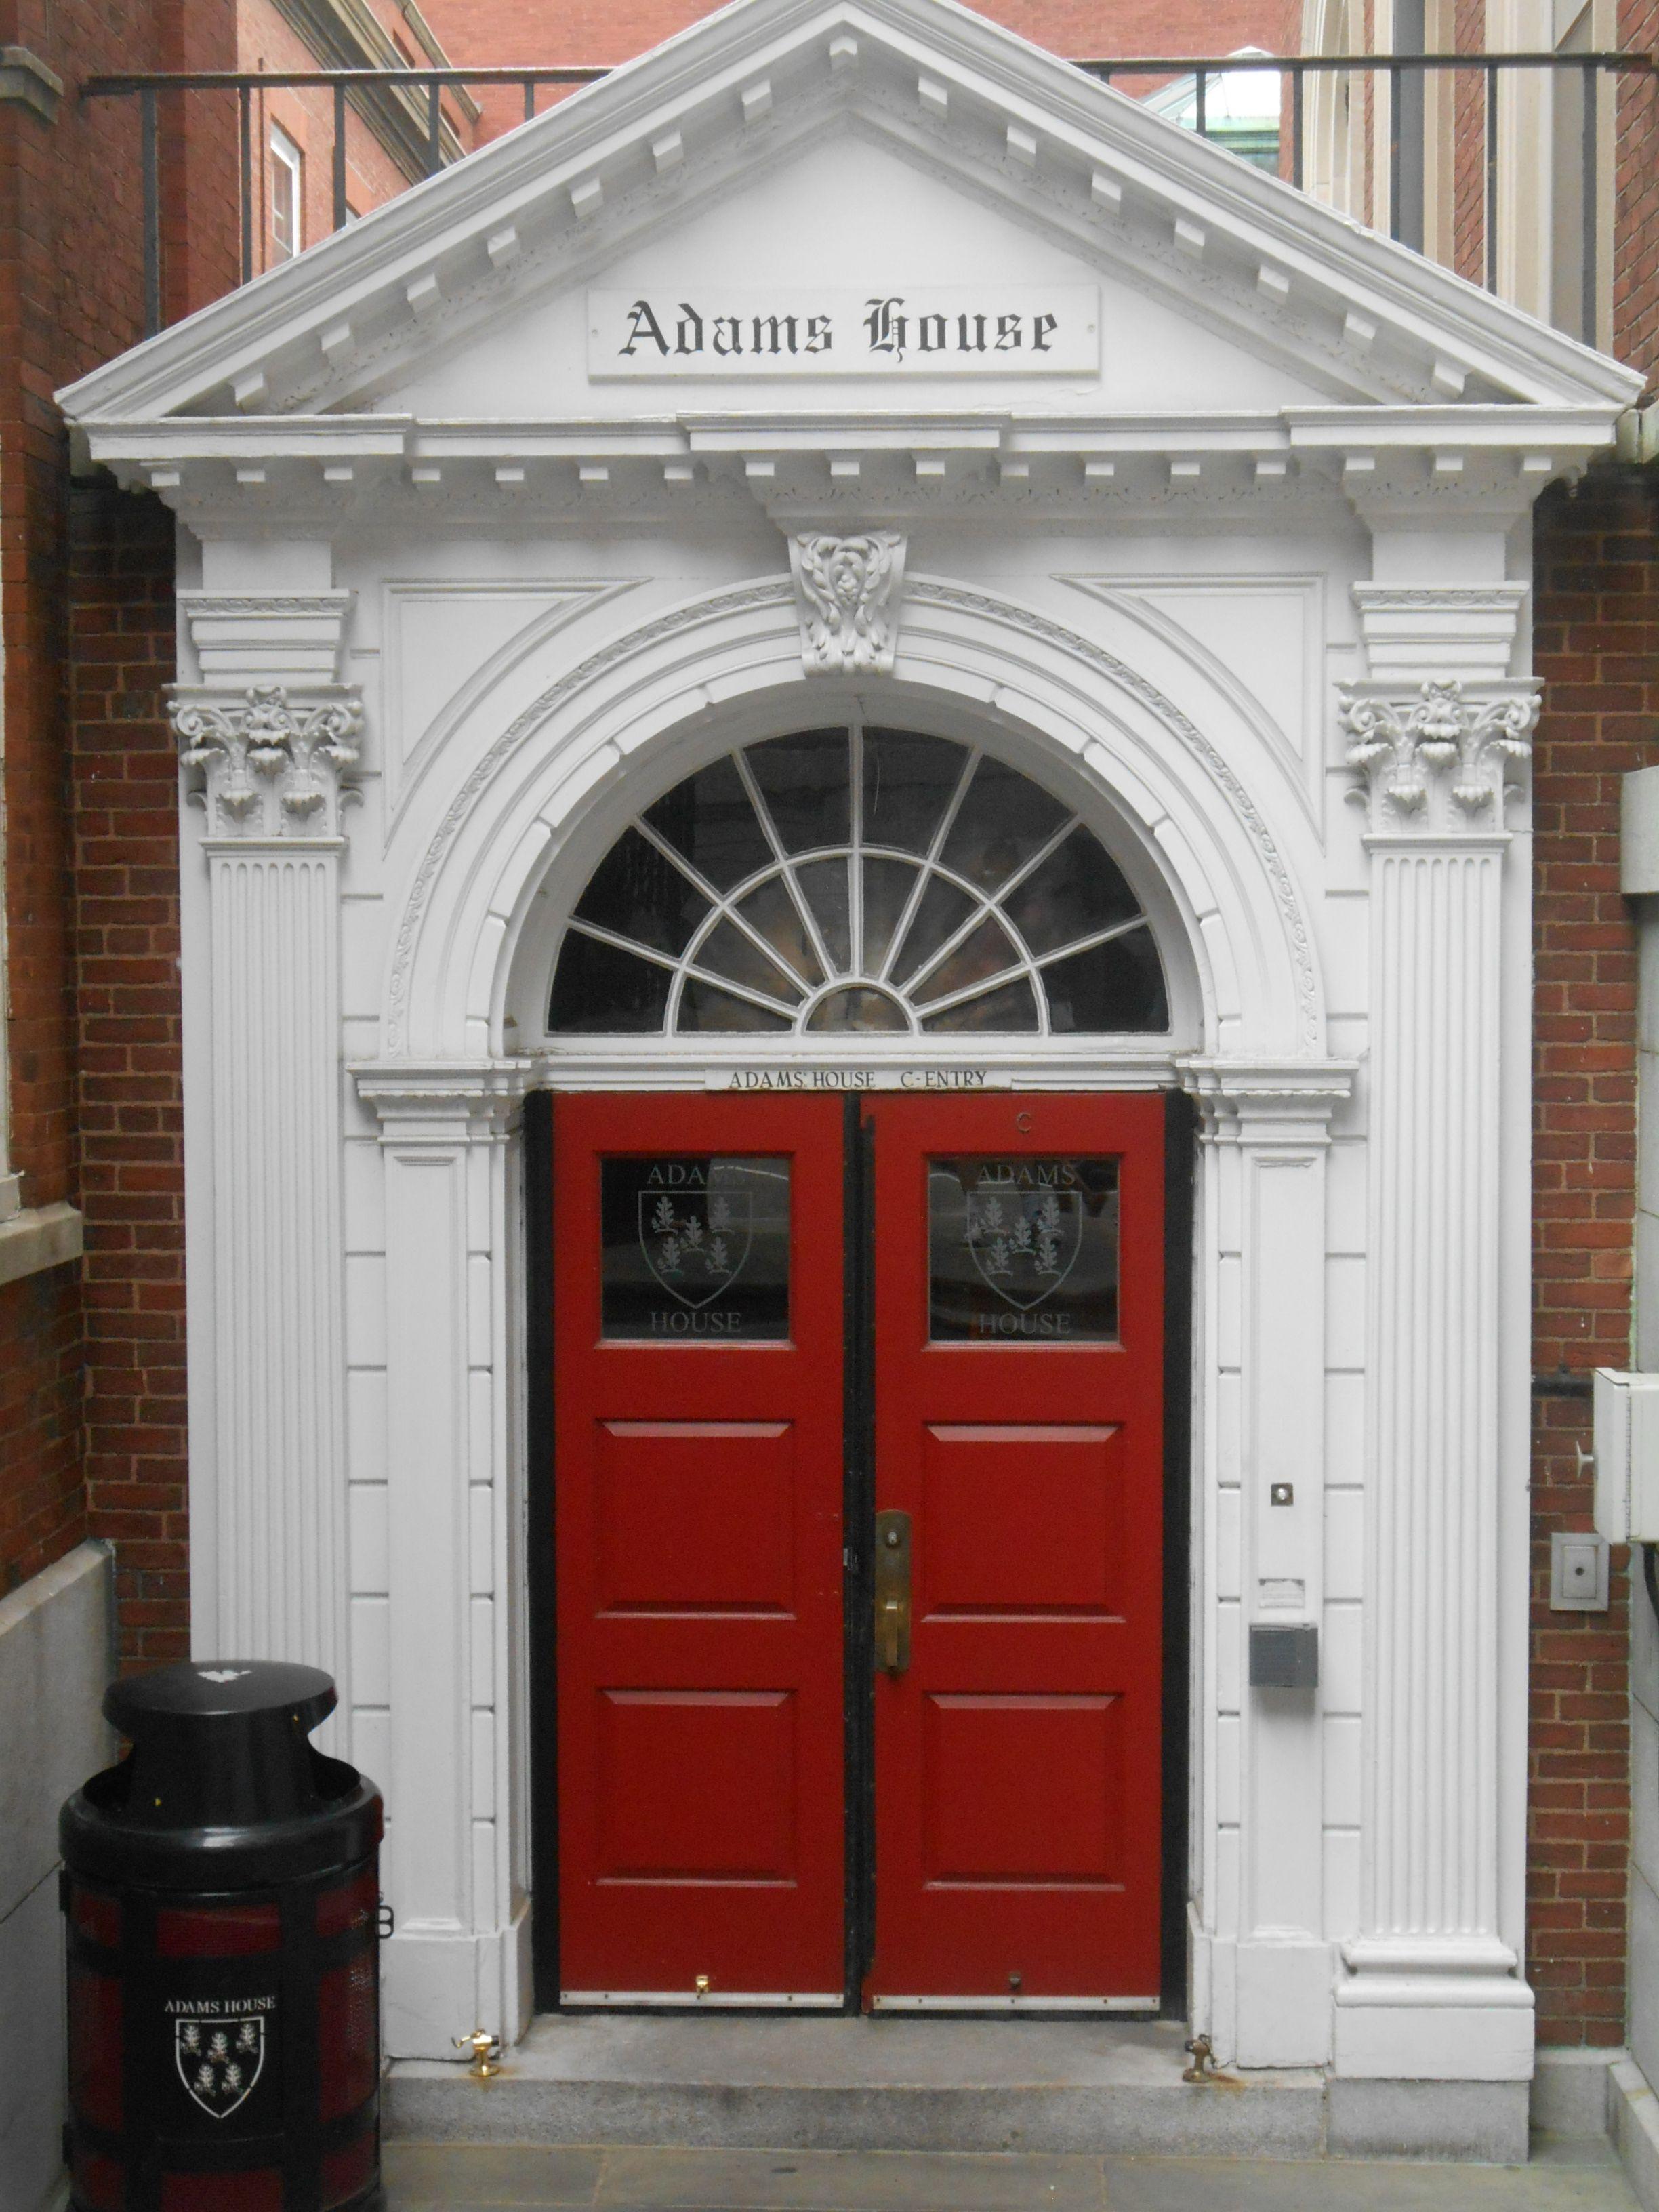 Dorm rooms at harvard mysterious door to a secret society   harvard university  pinterest